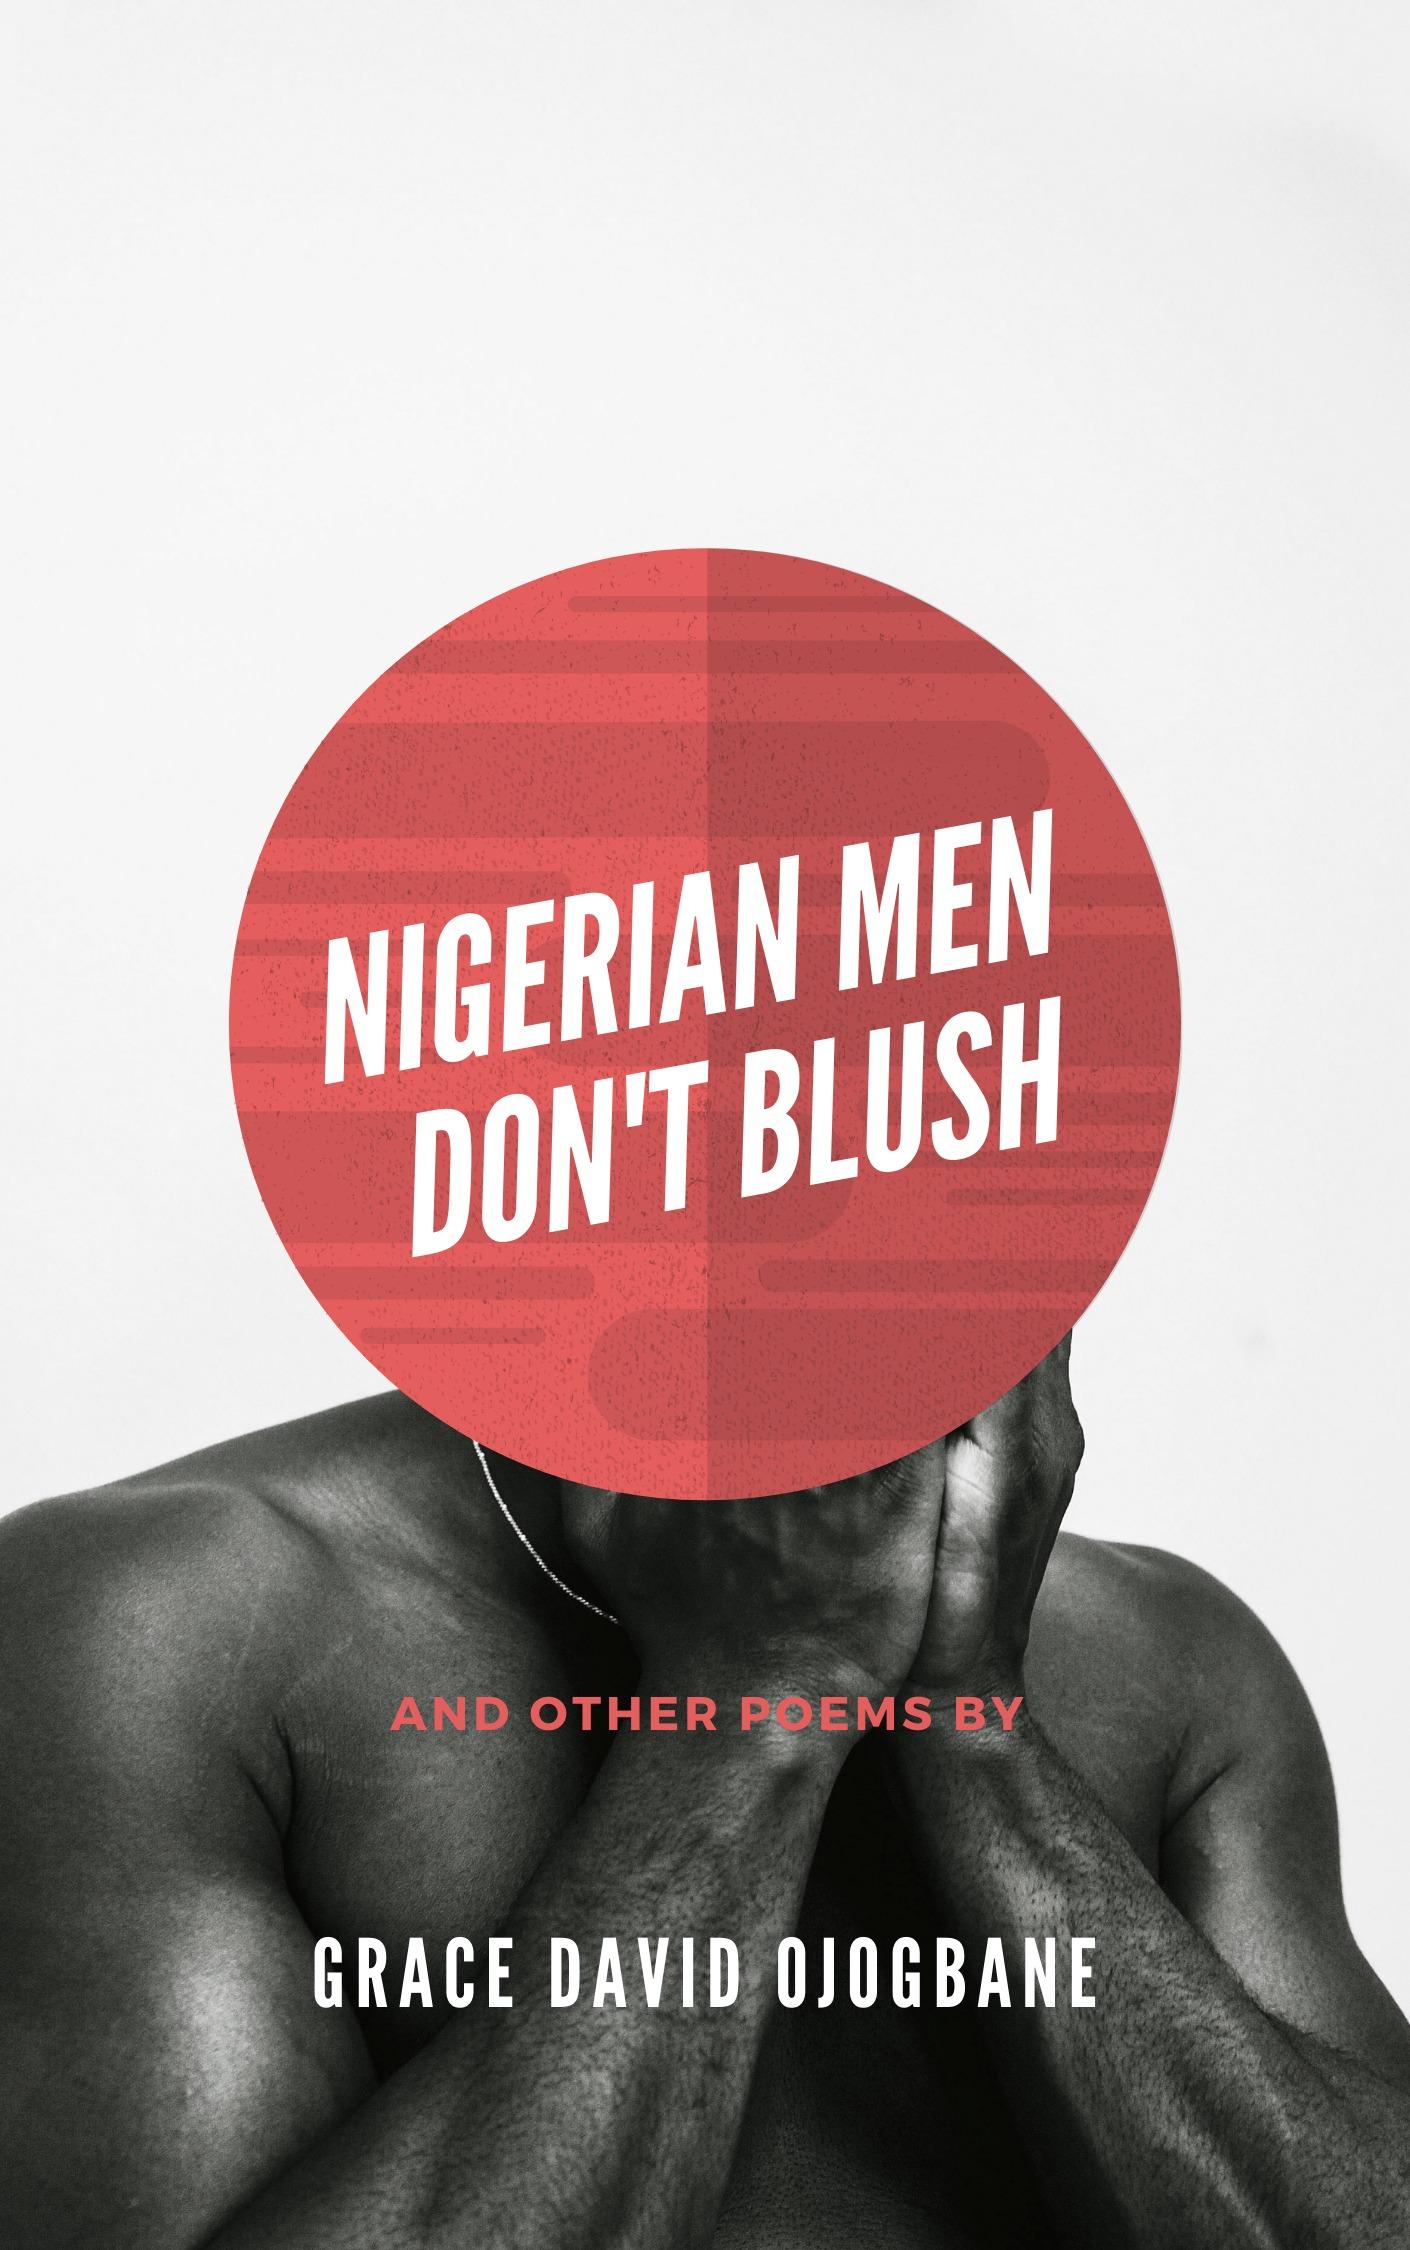 NIGERIAN MEN DON'T BLUSH